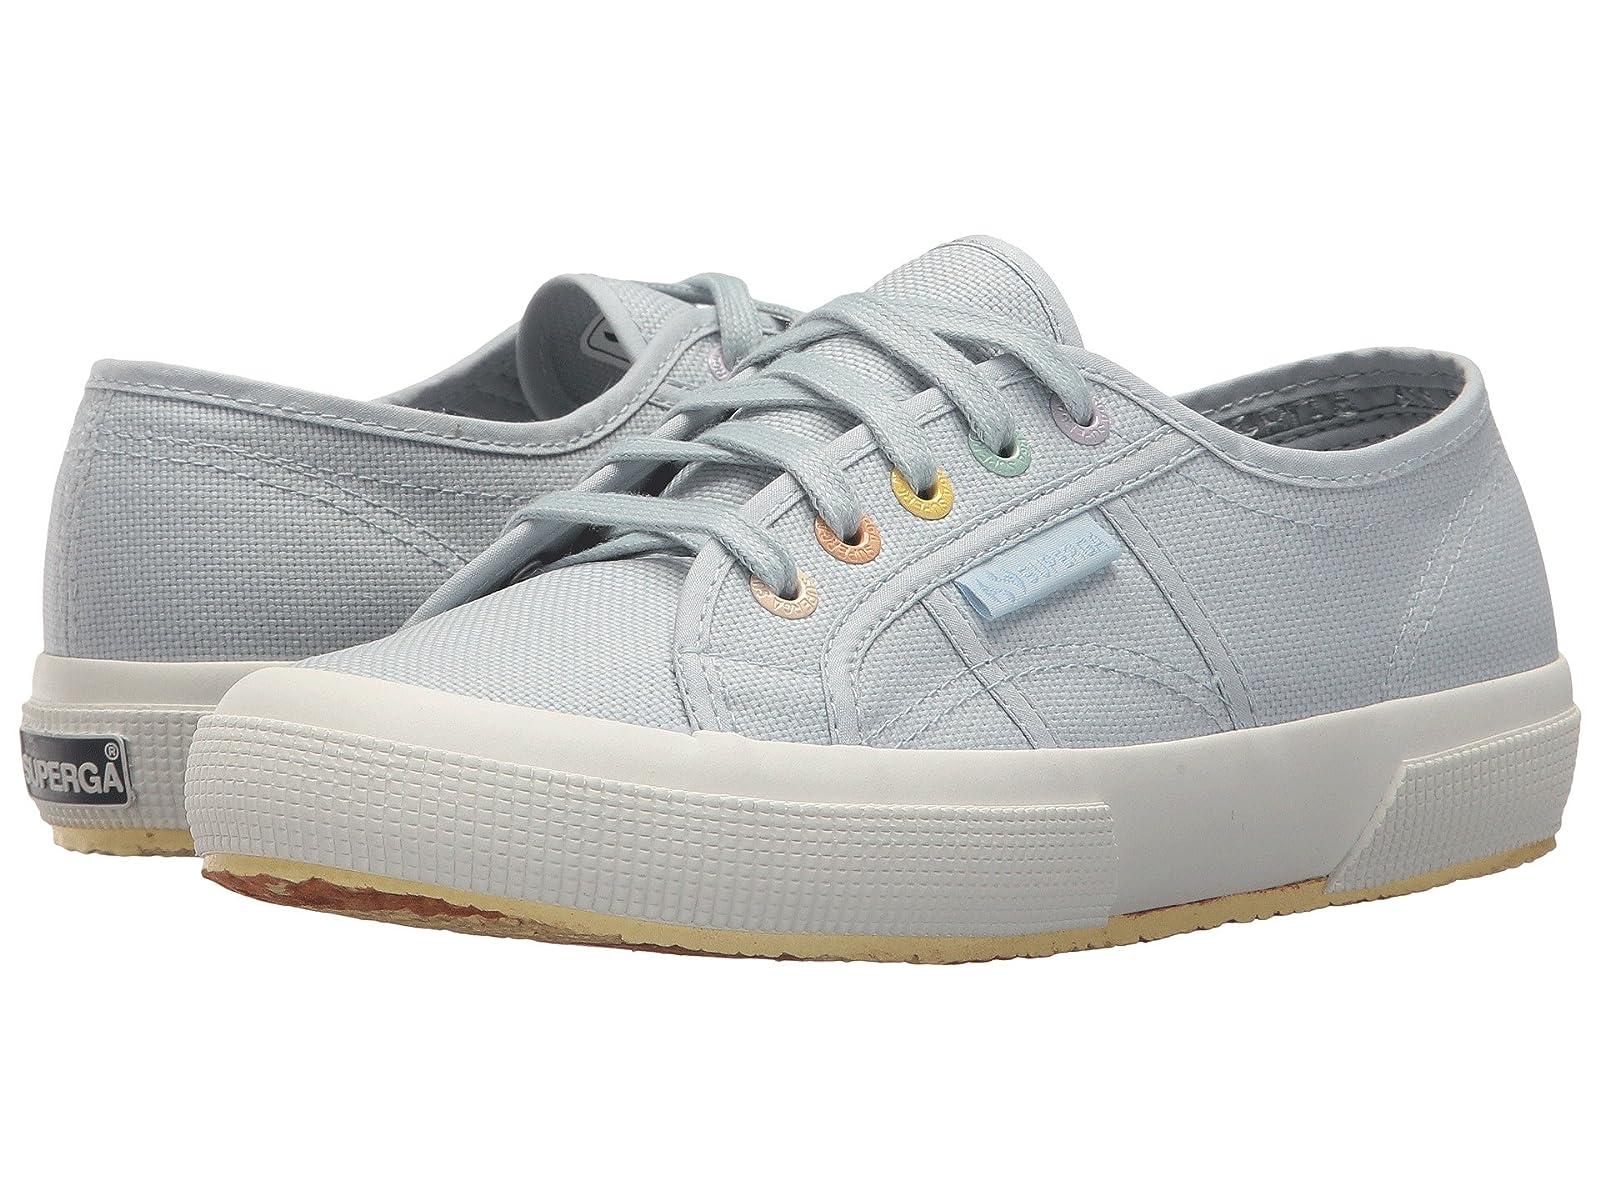 Superga 2750 Coloreycotw SneakerAtmospheric grades have affordable shoes